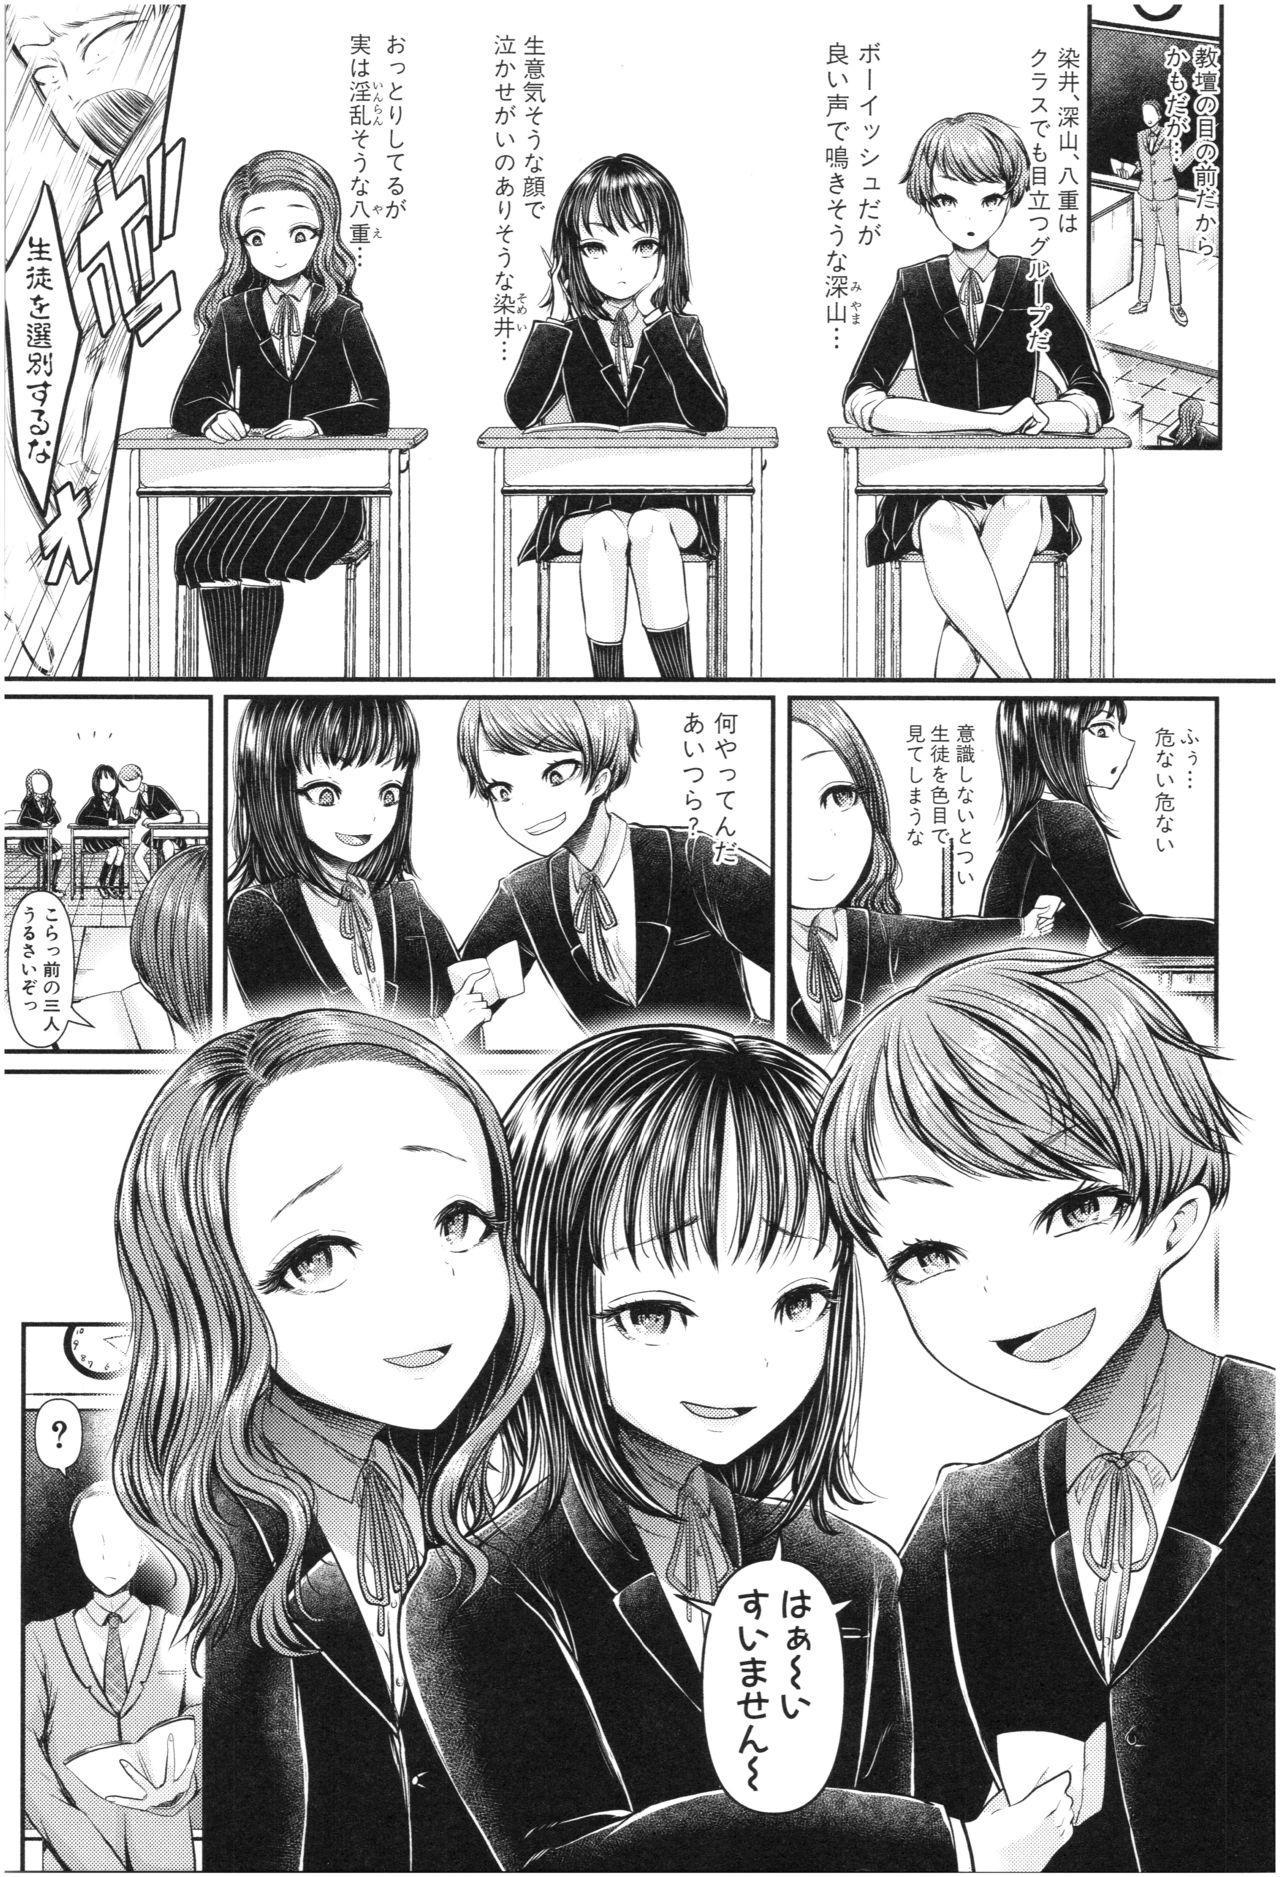 Sannenkan no Aoi Haru 7